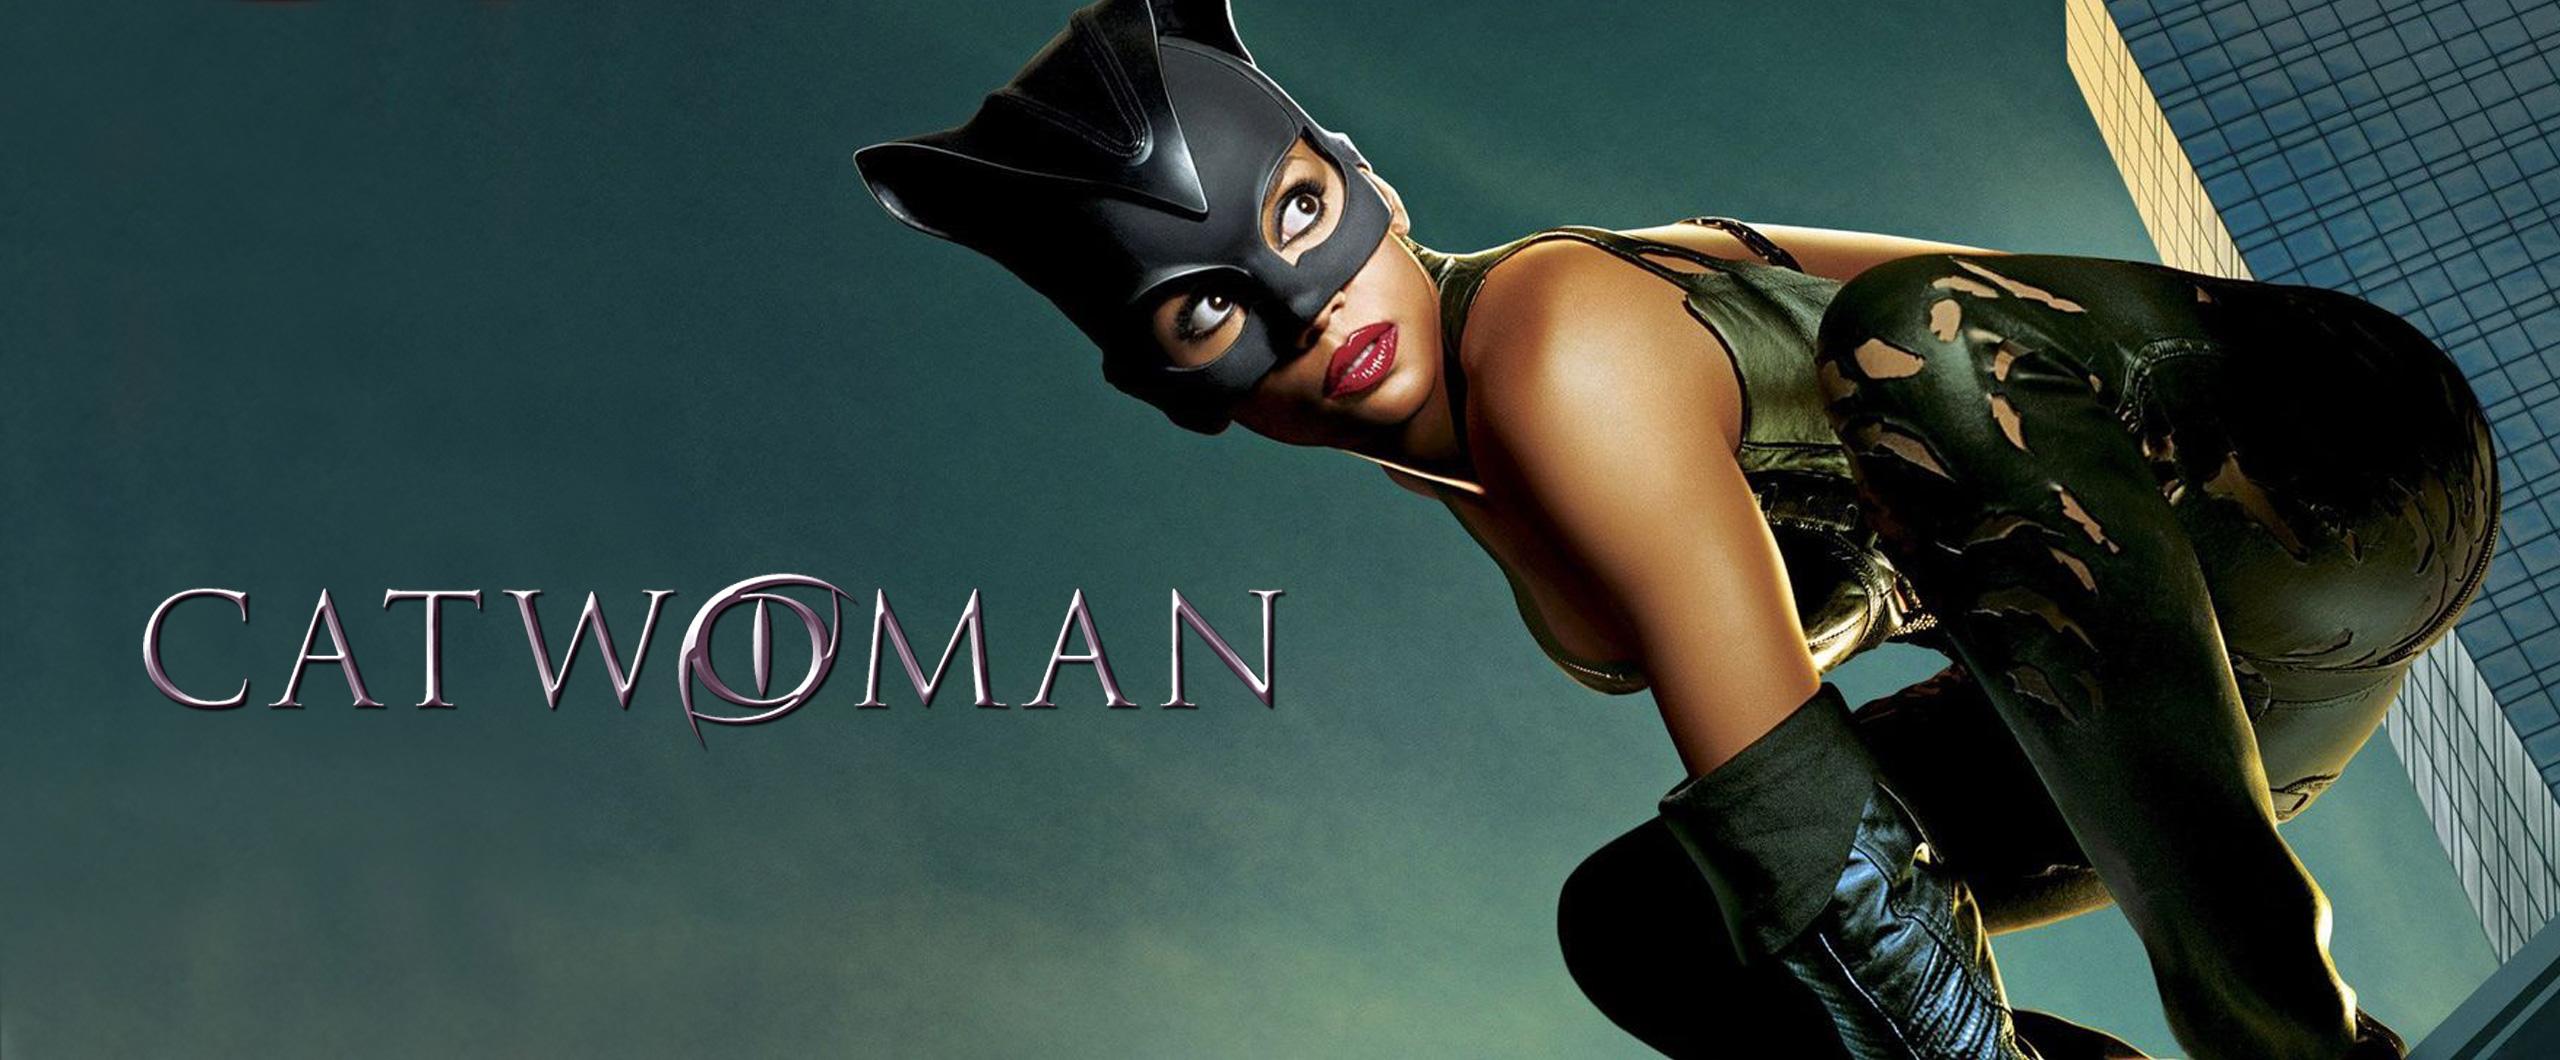 Catwoman - Sunday